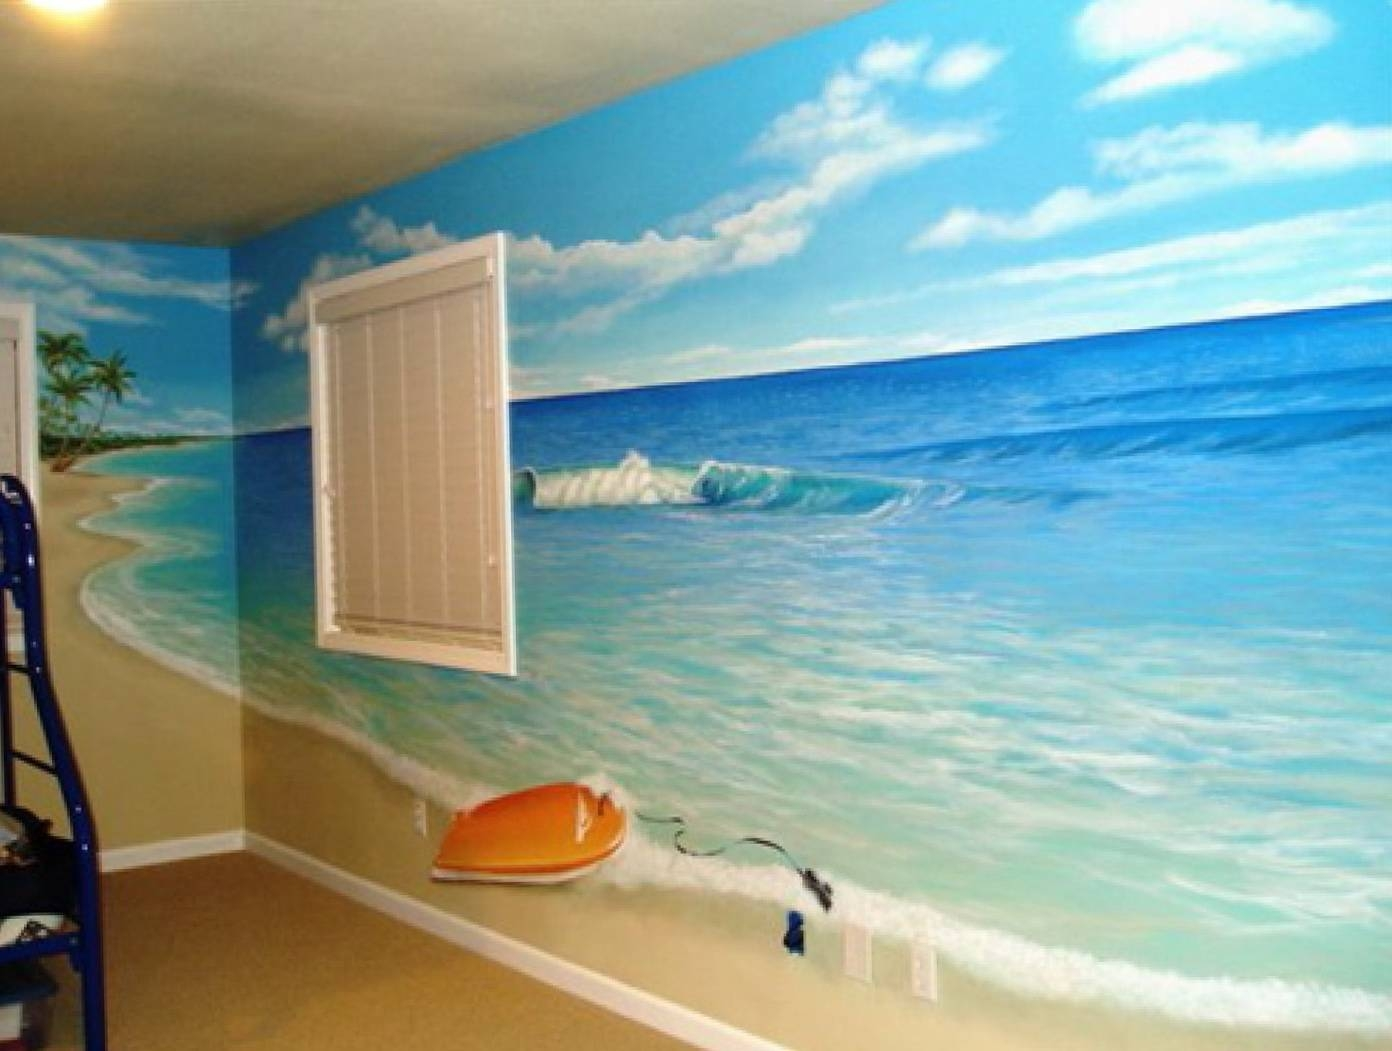 Beach Wall Art Ideas   Home Design Ideas With 2018 Beach 3D Wall Art (View 10 of 20)